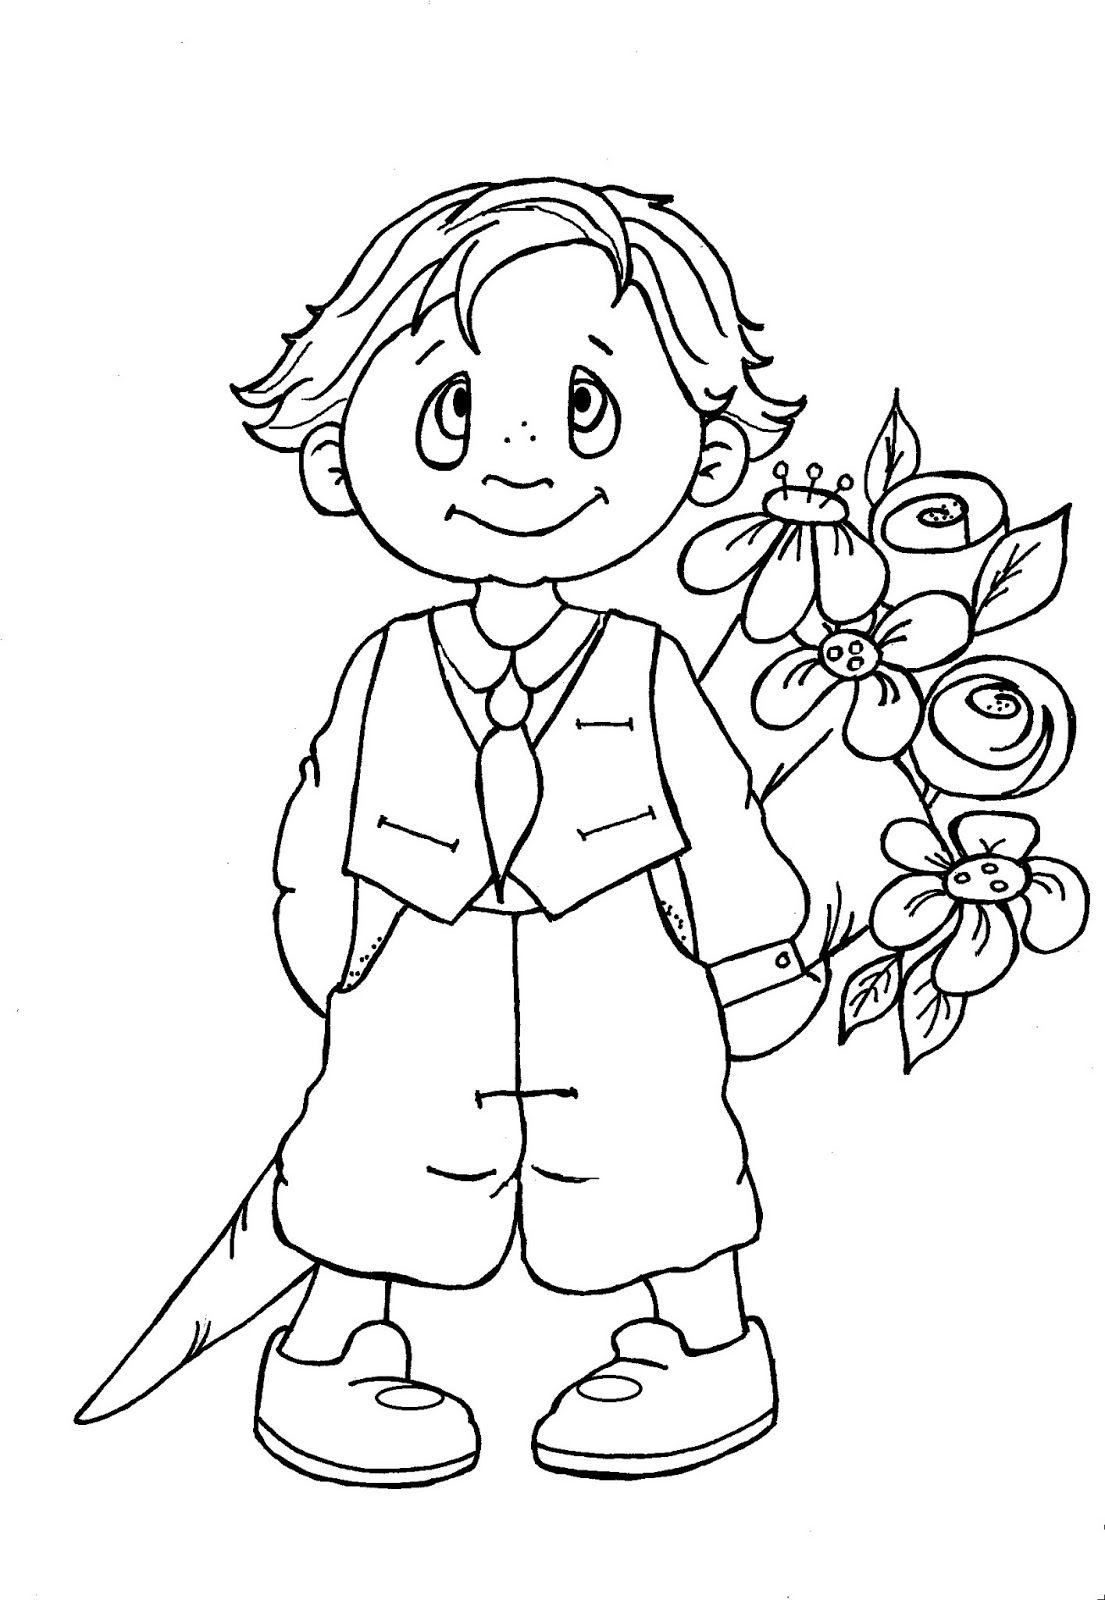 My Freebies: Giving flowers